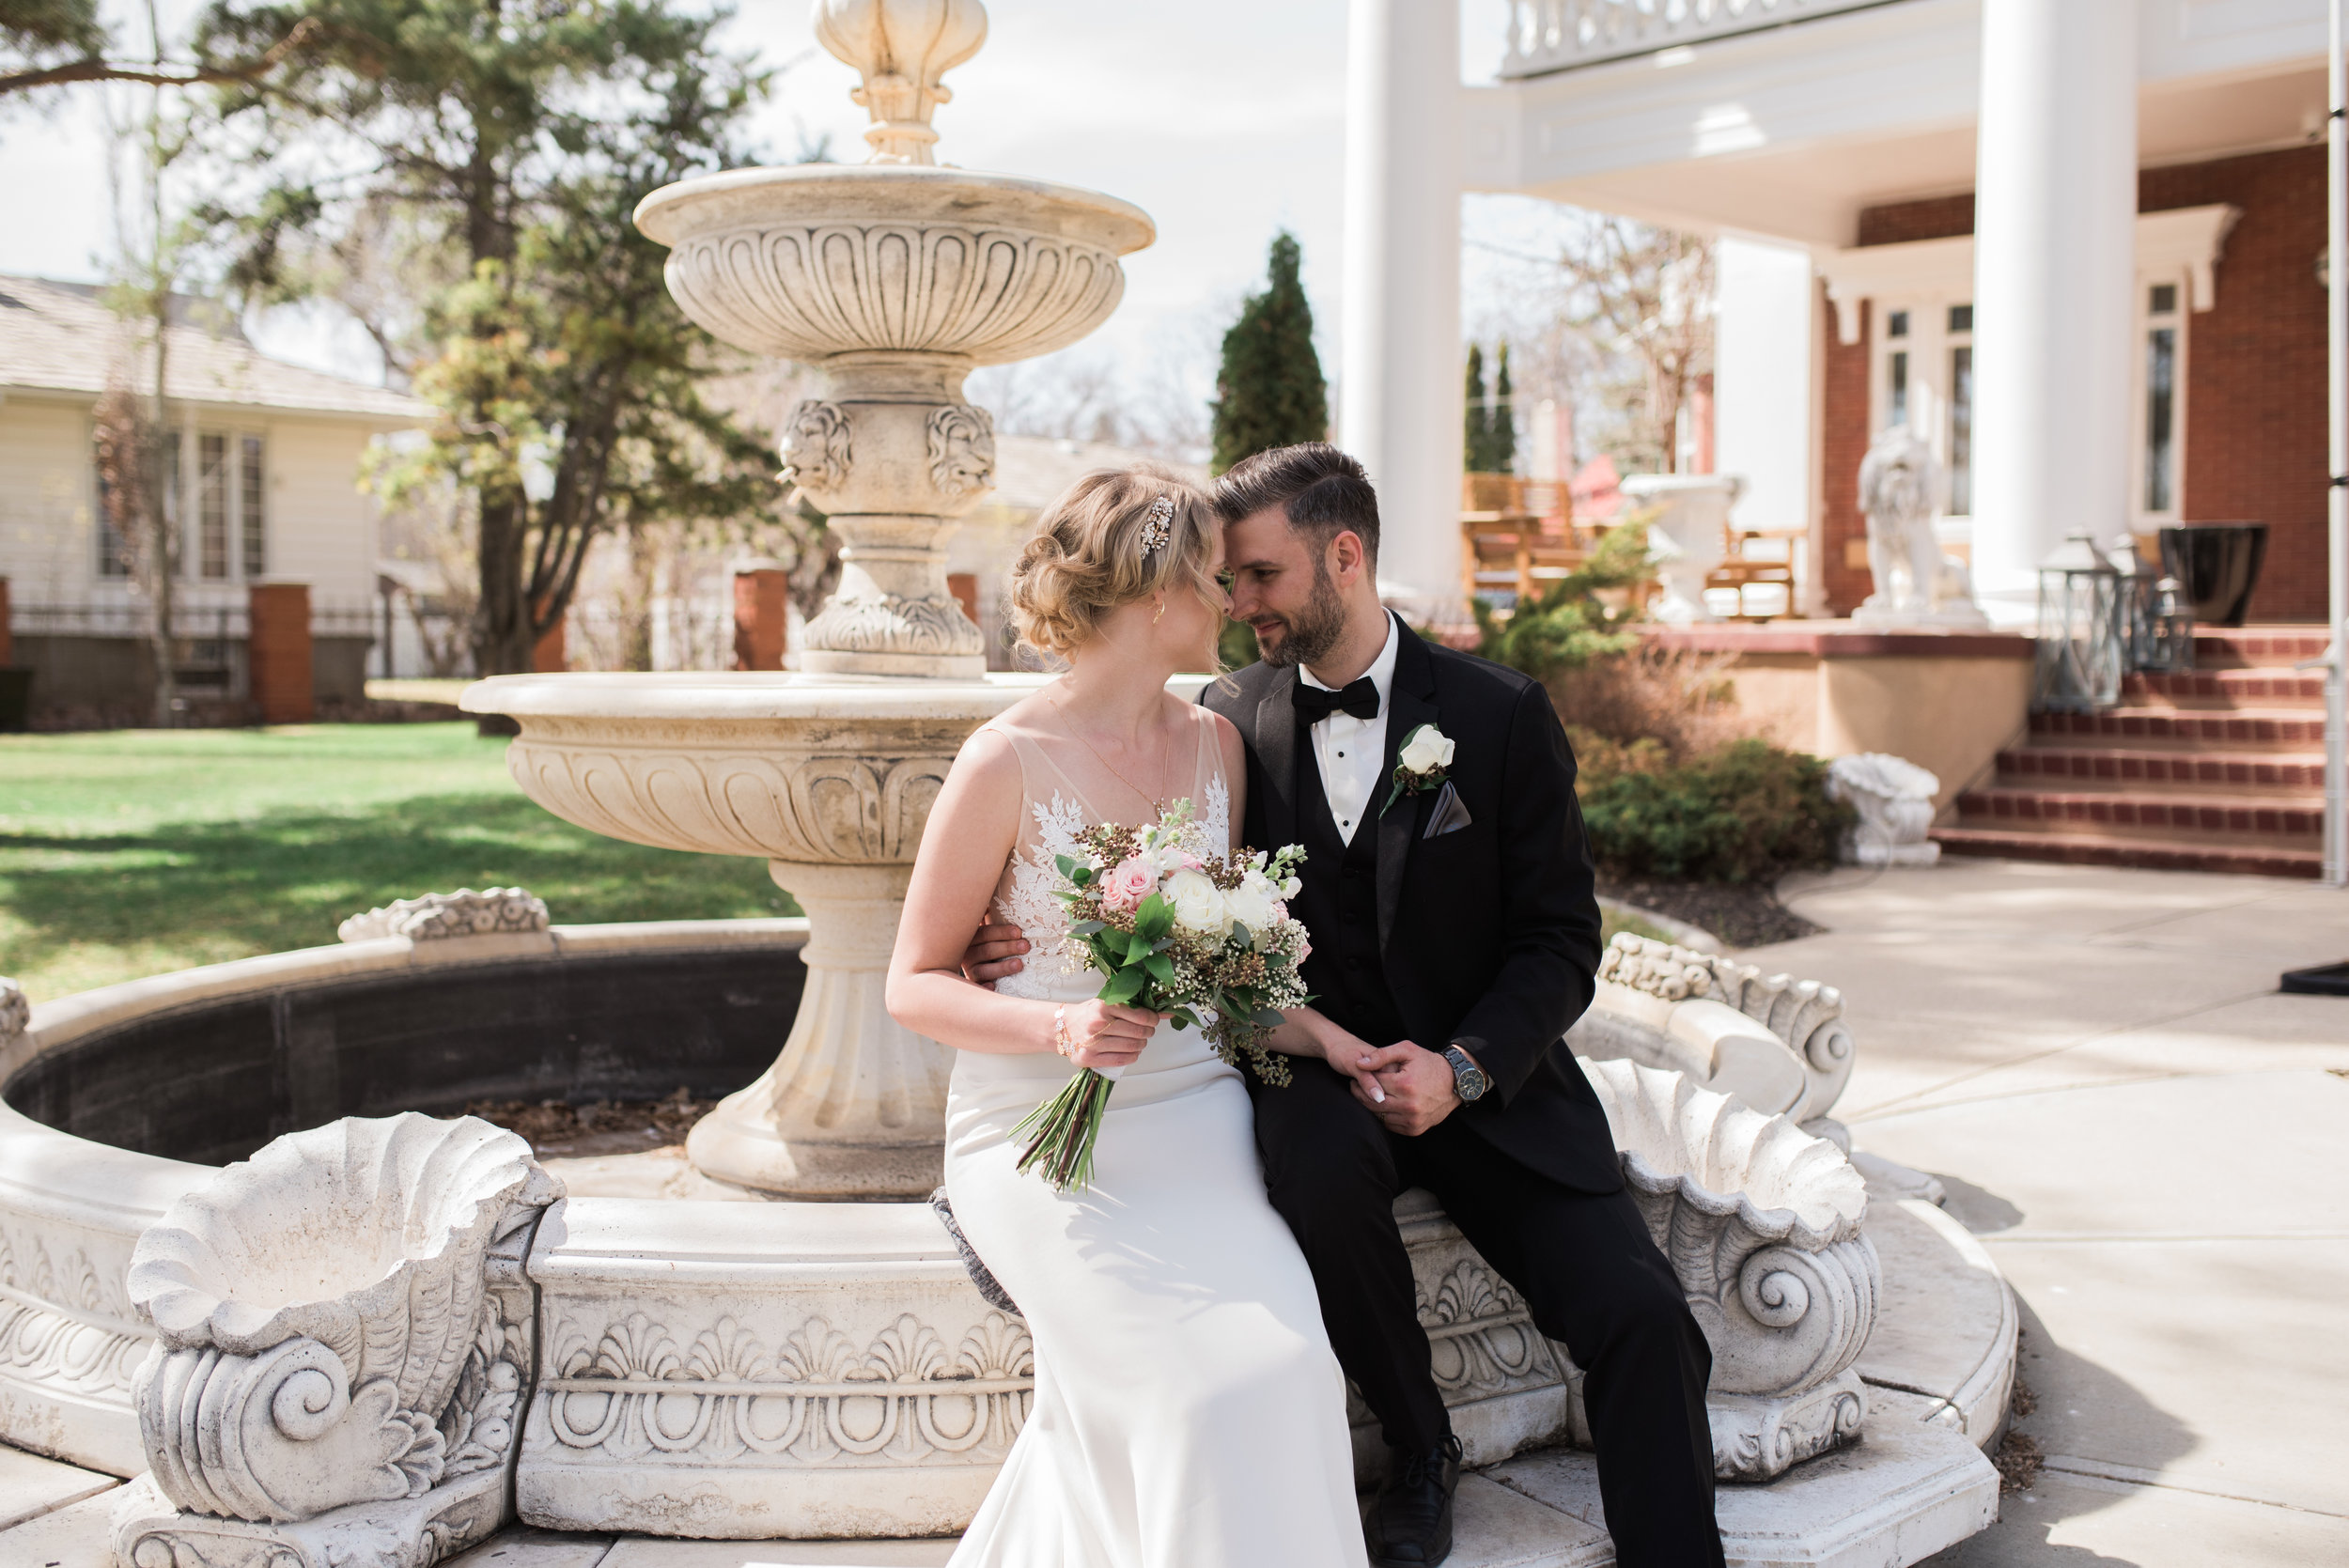 Ali Samantha Wedding 784.jpg